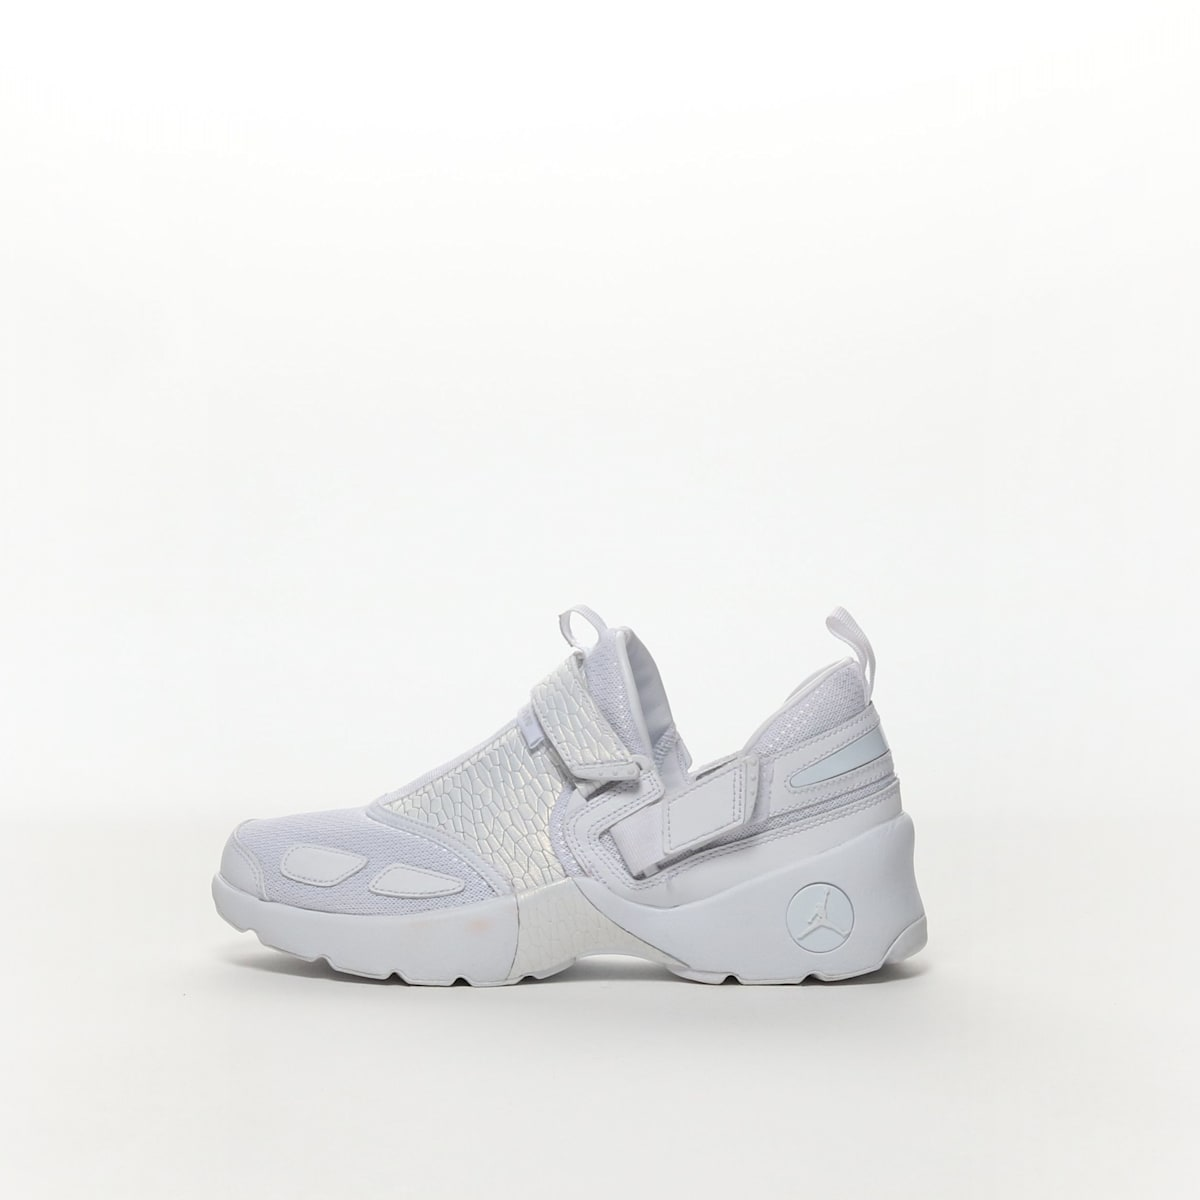 d6c837adf6a9 Girls  Jordan Trunner LX Premium Heiress Collection Shoe - WHITE ...